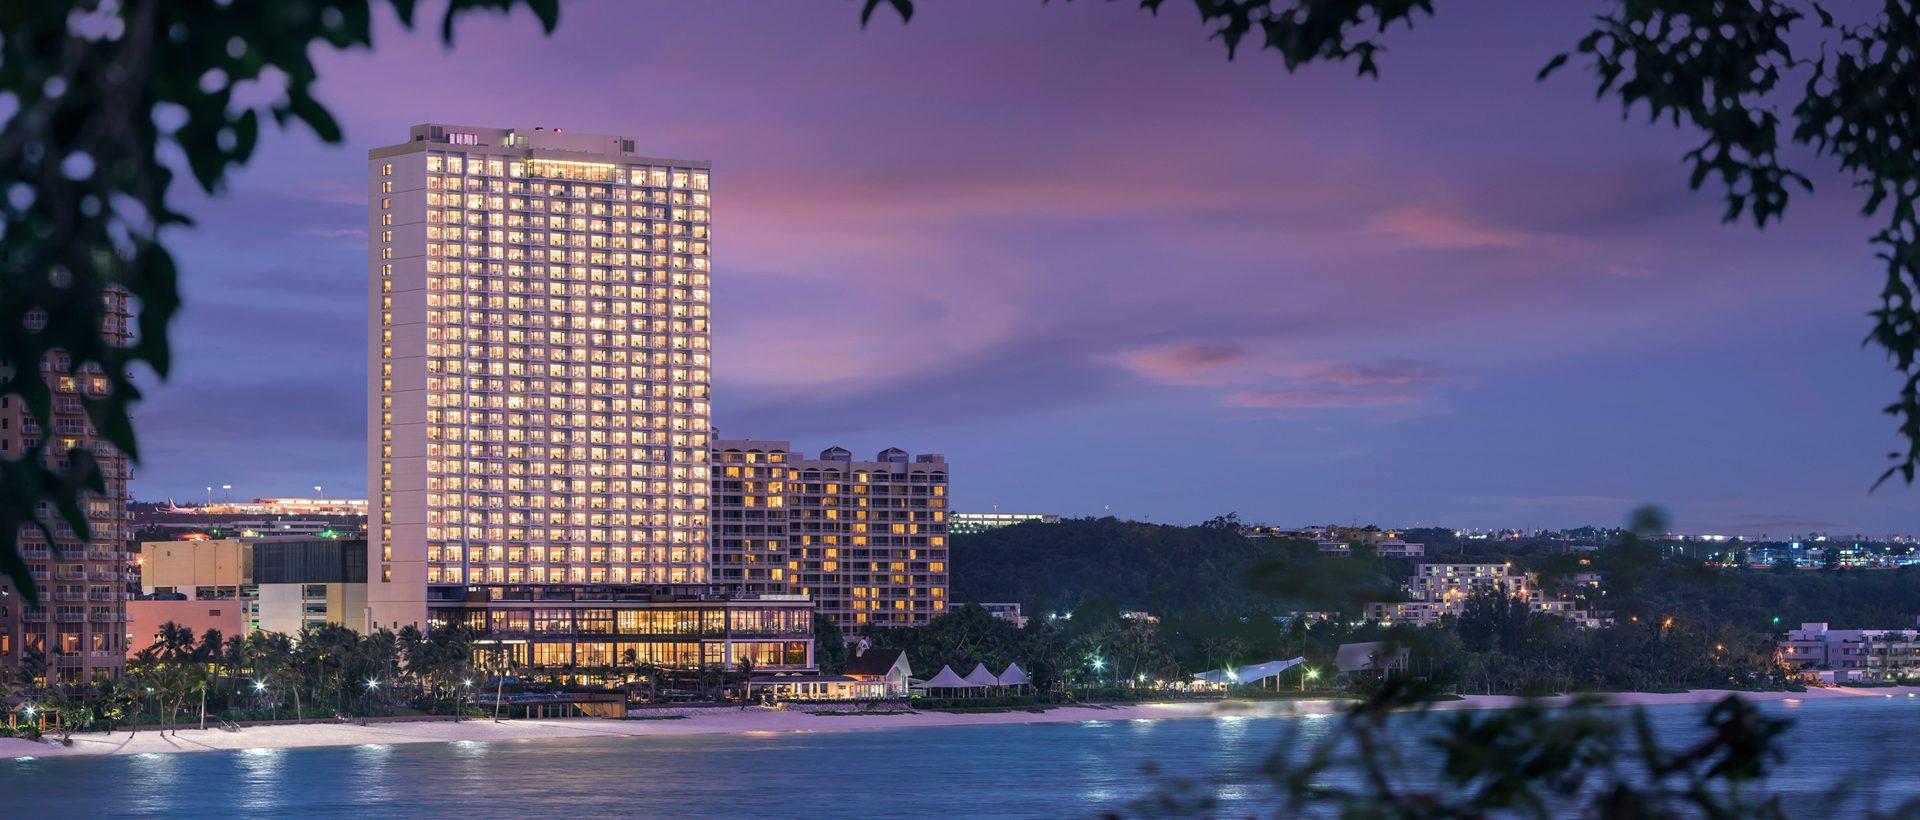 dusit thani guam resort - hotel-exterior-night